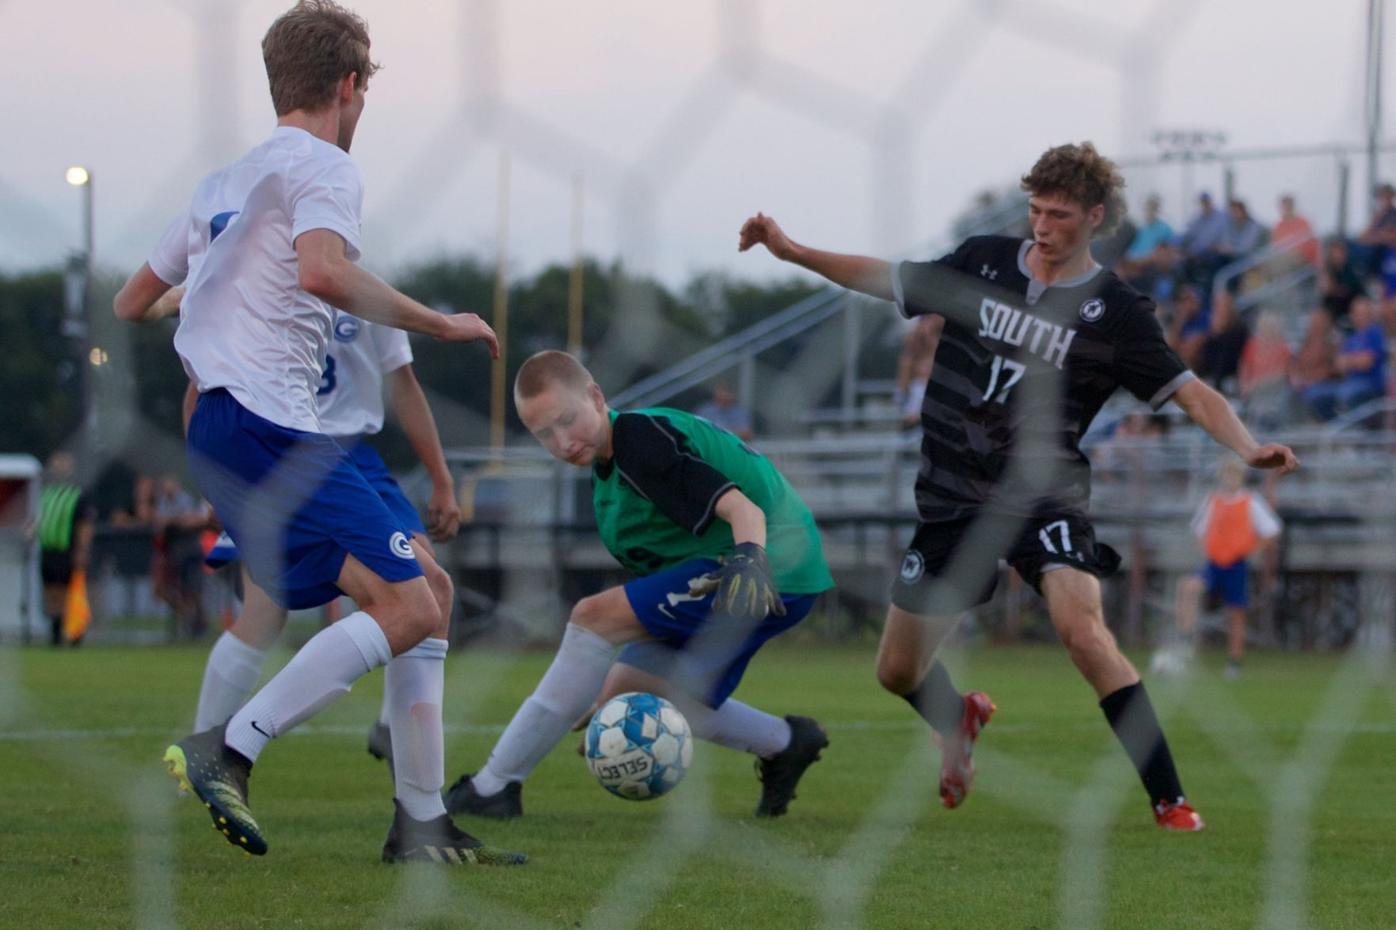 211013-sports-South Warren vs. Glasgow Region 4 BOYS' Soccer Tournament Semifinals_outbound 4.jpg